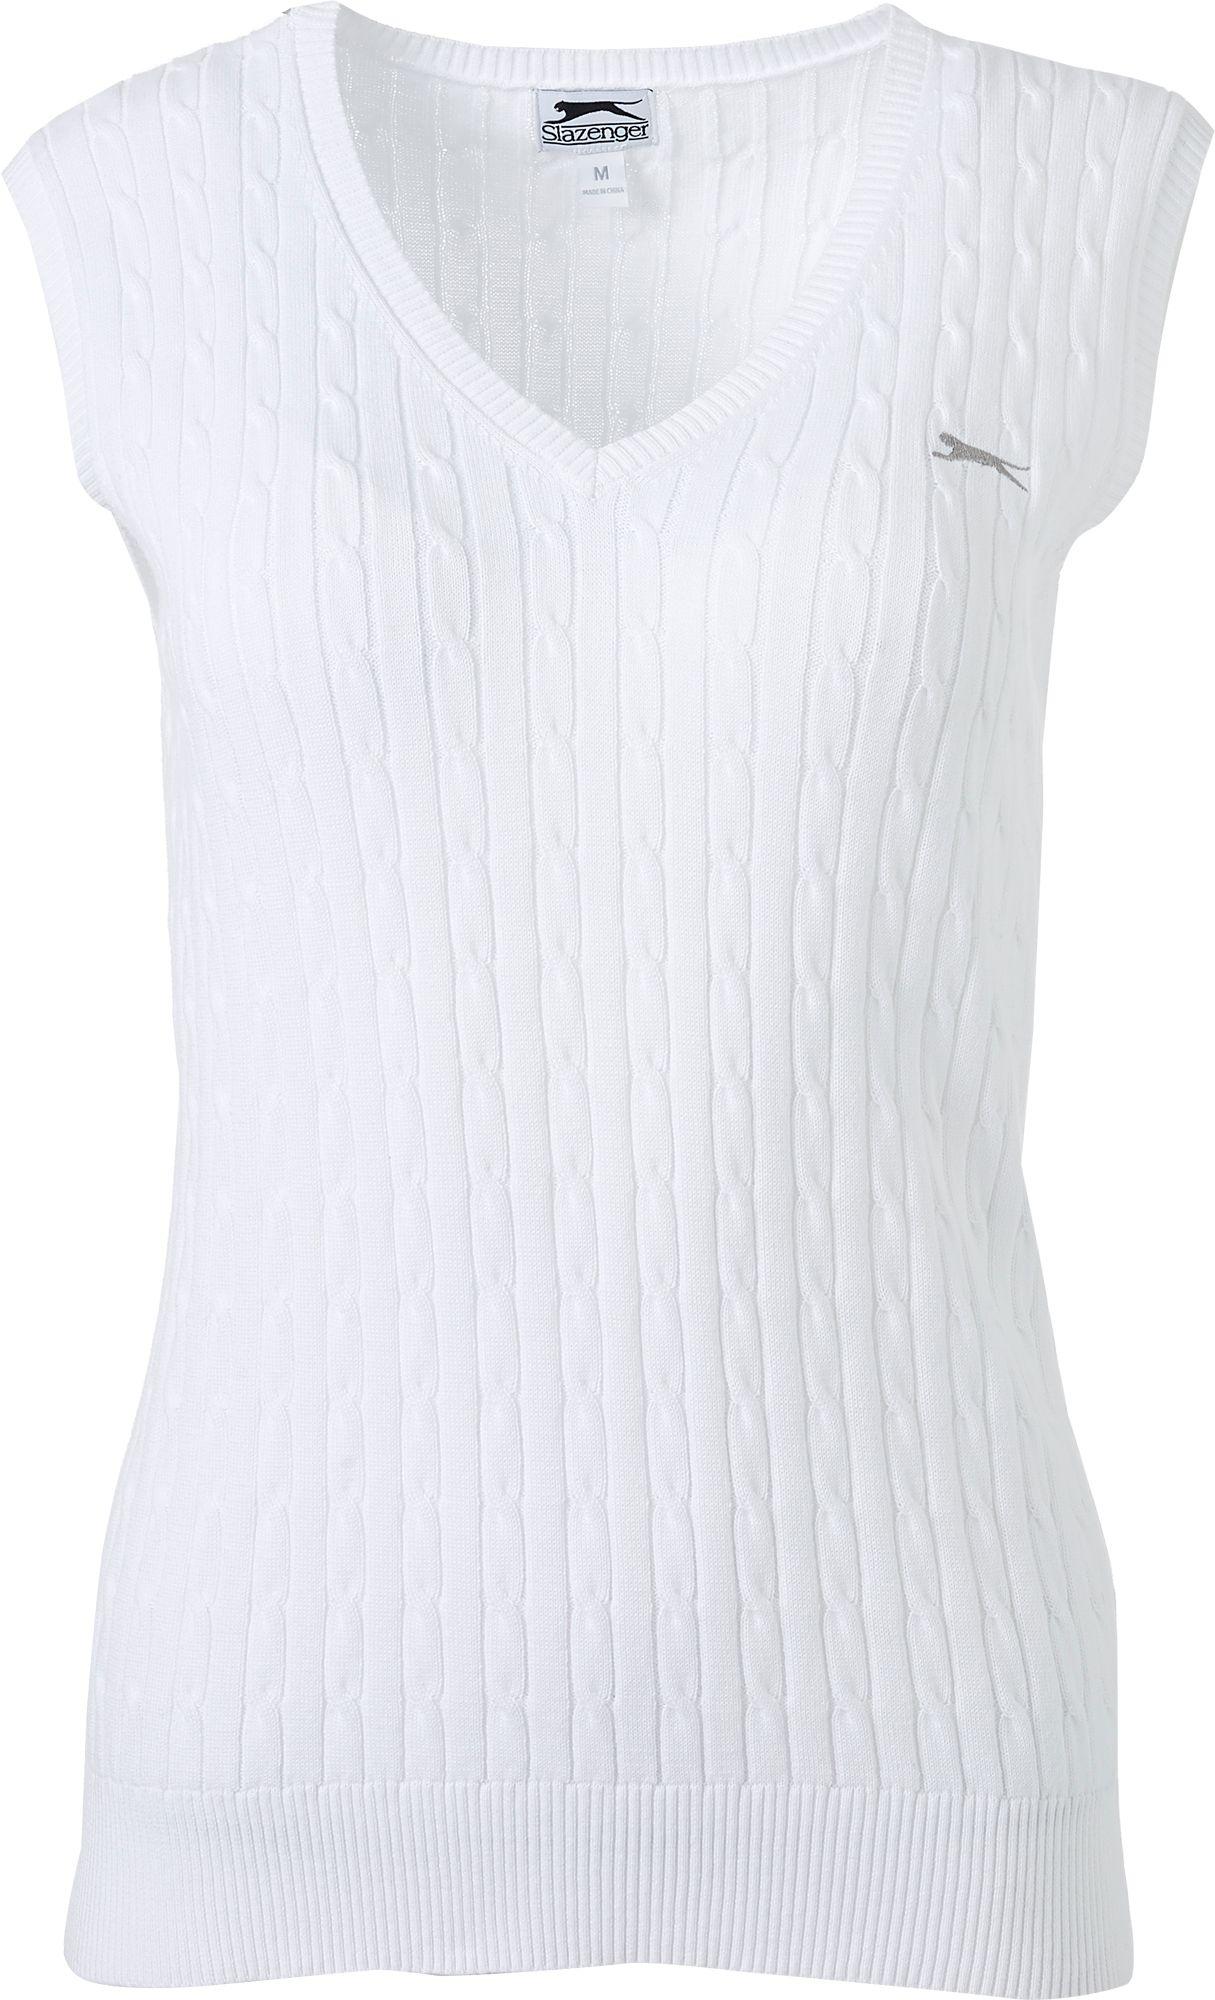 Slazenger Women's Tennis Sweater Vest   DICK'S Sporting Goods